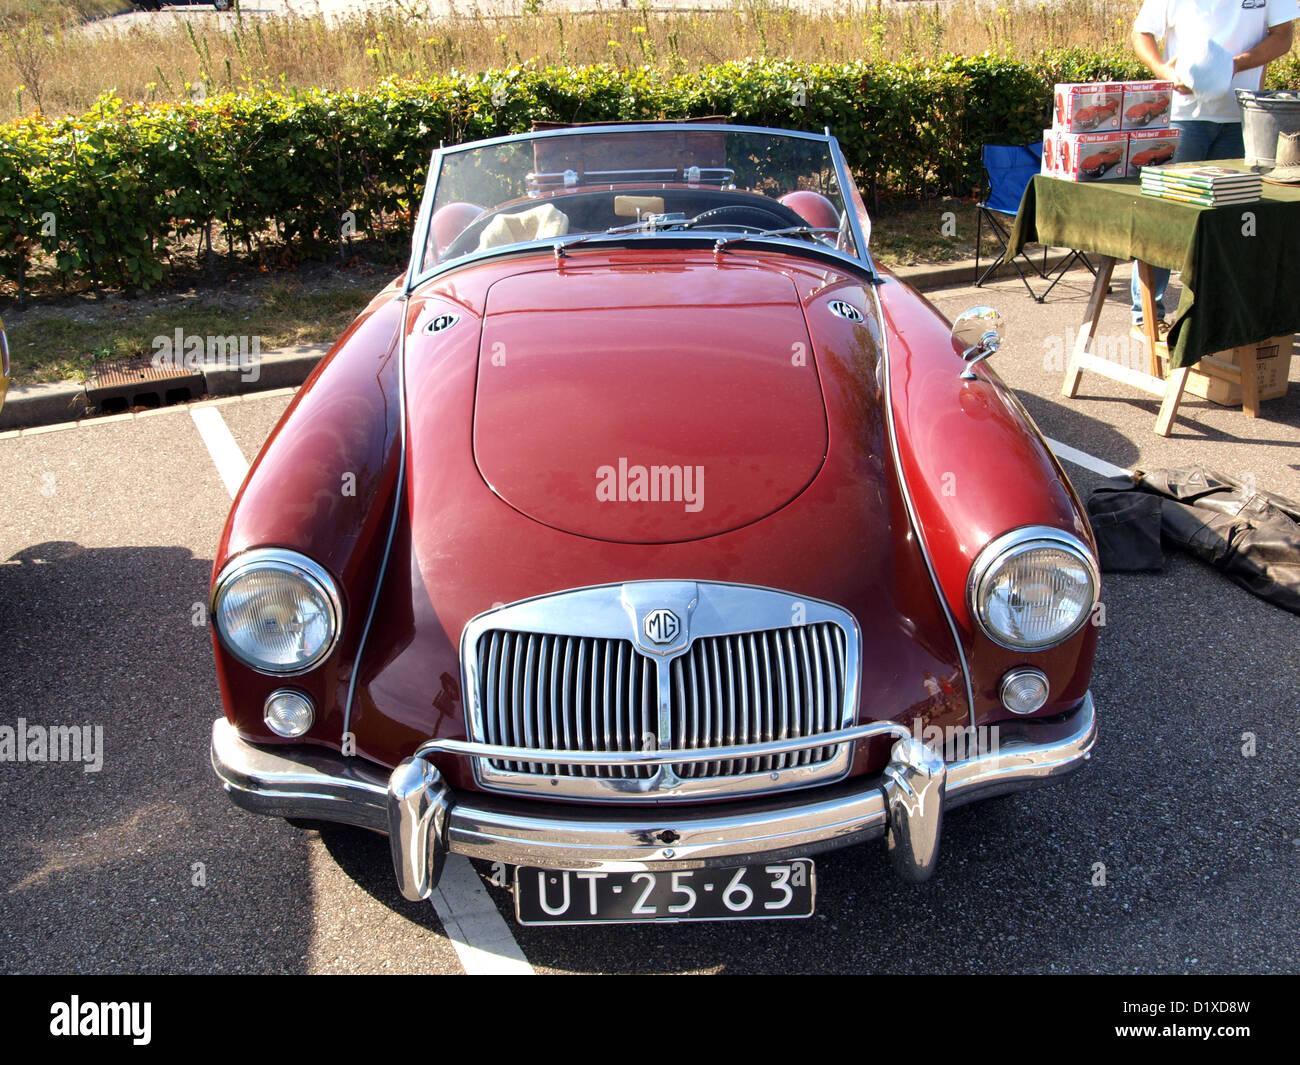 Classic Car Meeting Haarlem MG UT - Stock Image